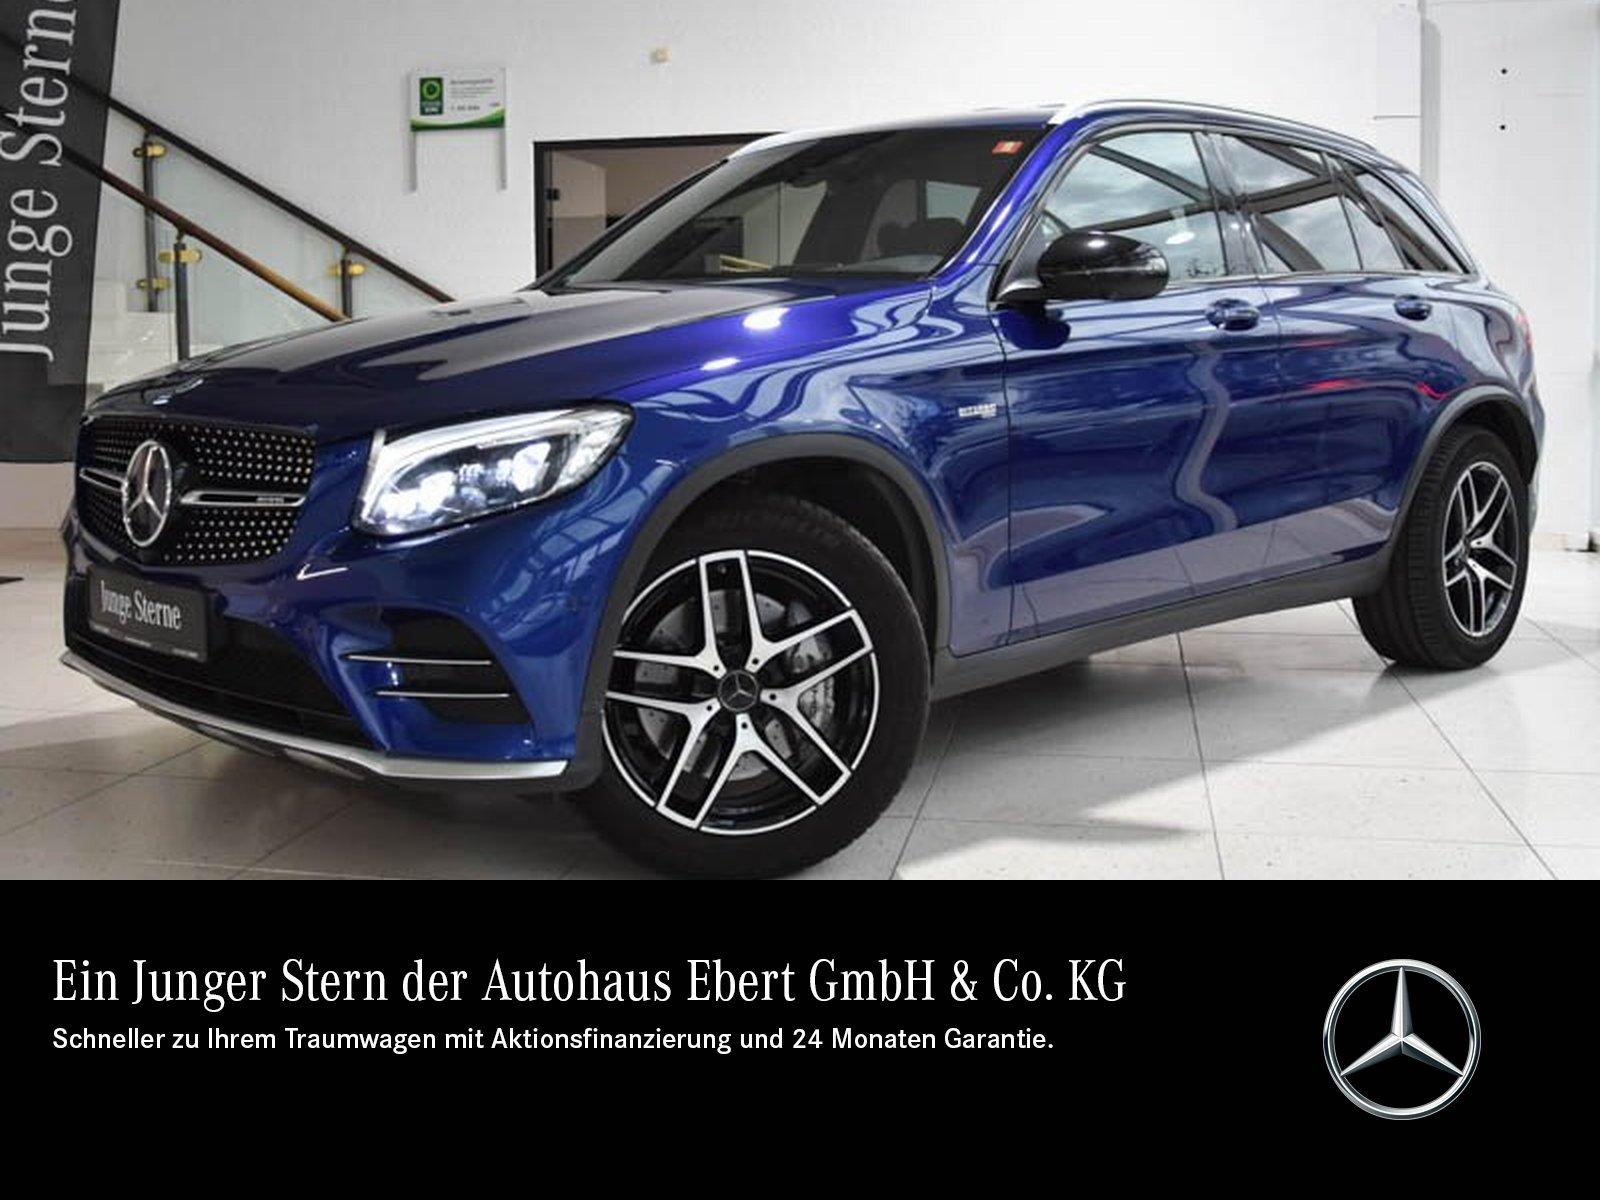 Mercedes-Benz GLC 43 AMG 4M 9G+COMAND+HUD+AHK+ILS+DISTR.+360°, Jahr 2017, Benzin